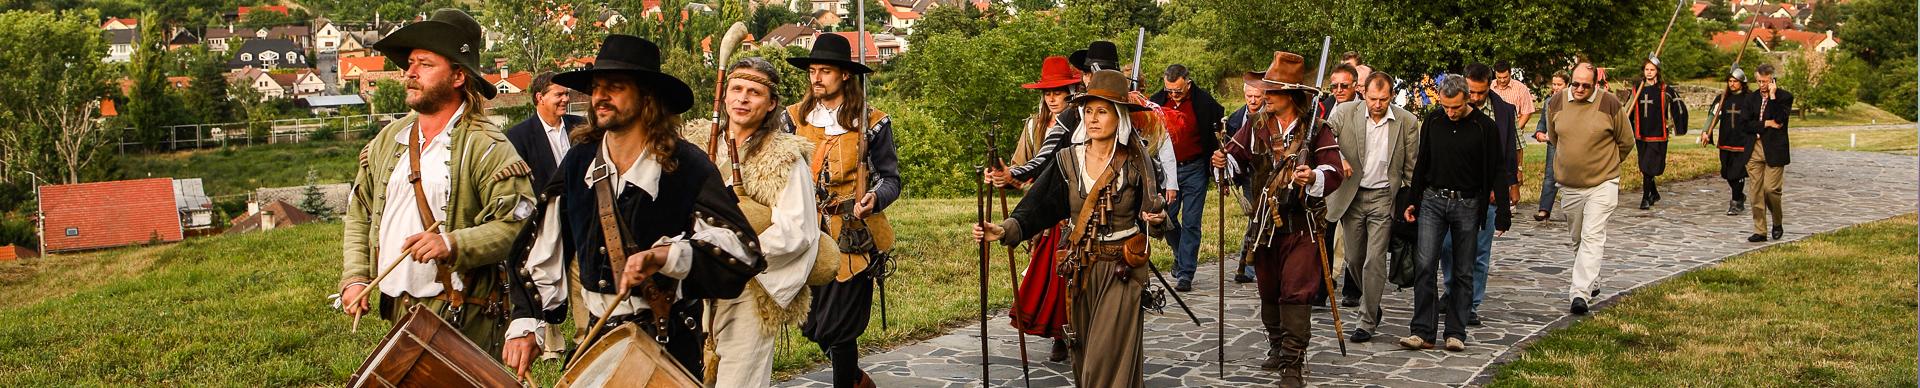 Bratislava Themenabend